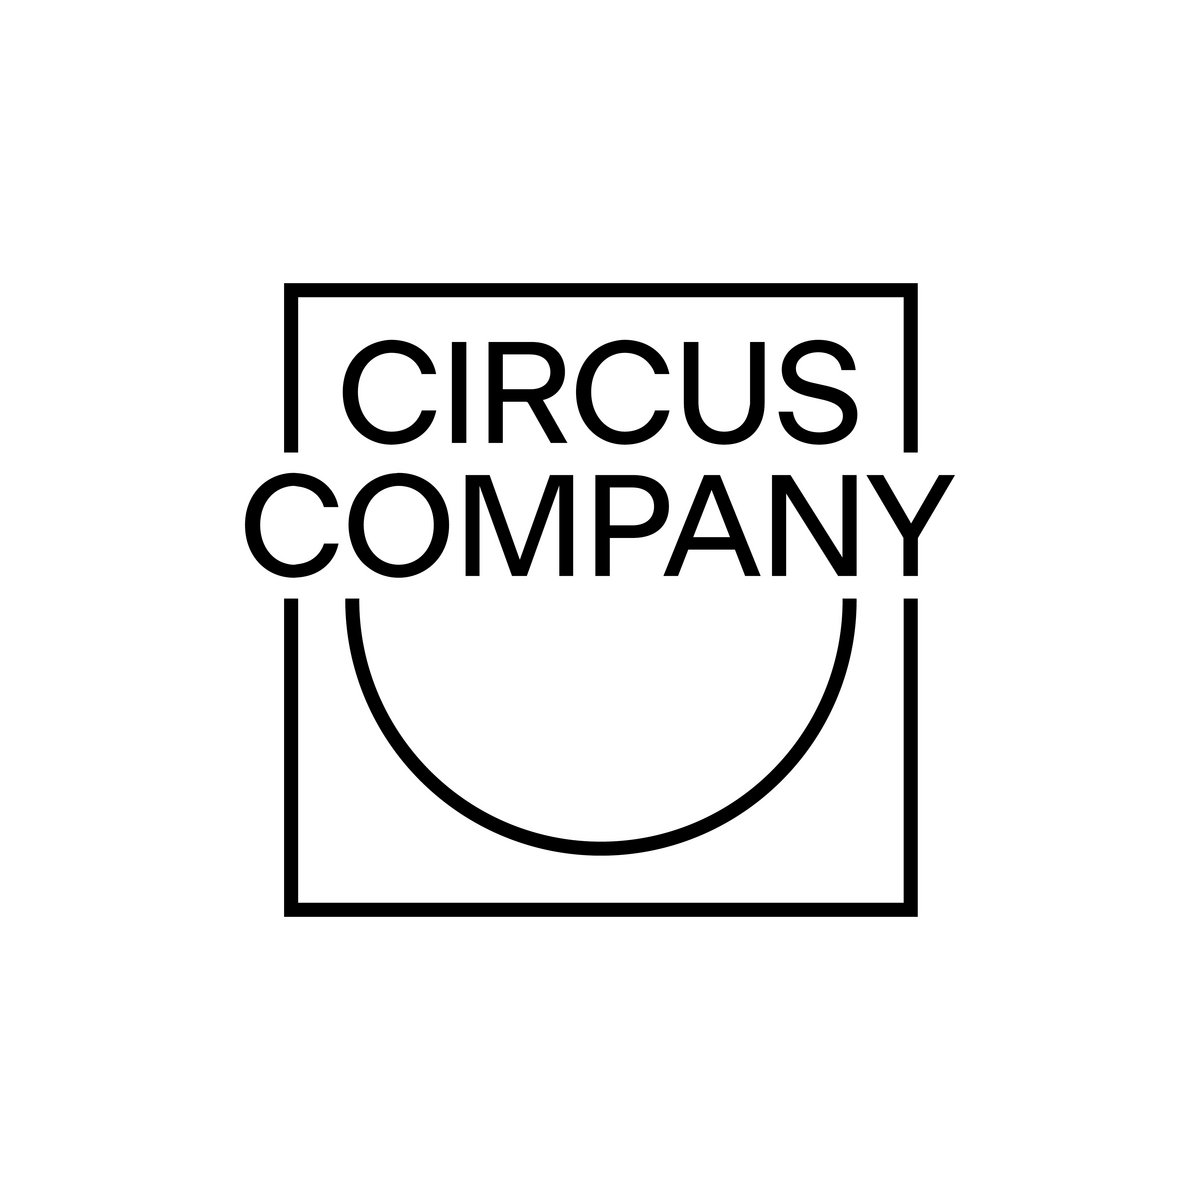 Circus Company Label [Electronic, Electro Pop, Electro Acoustic]